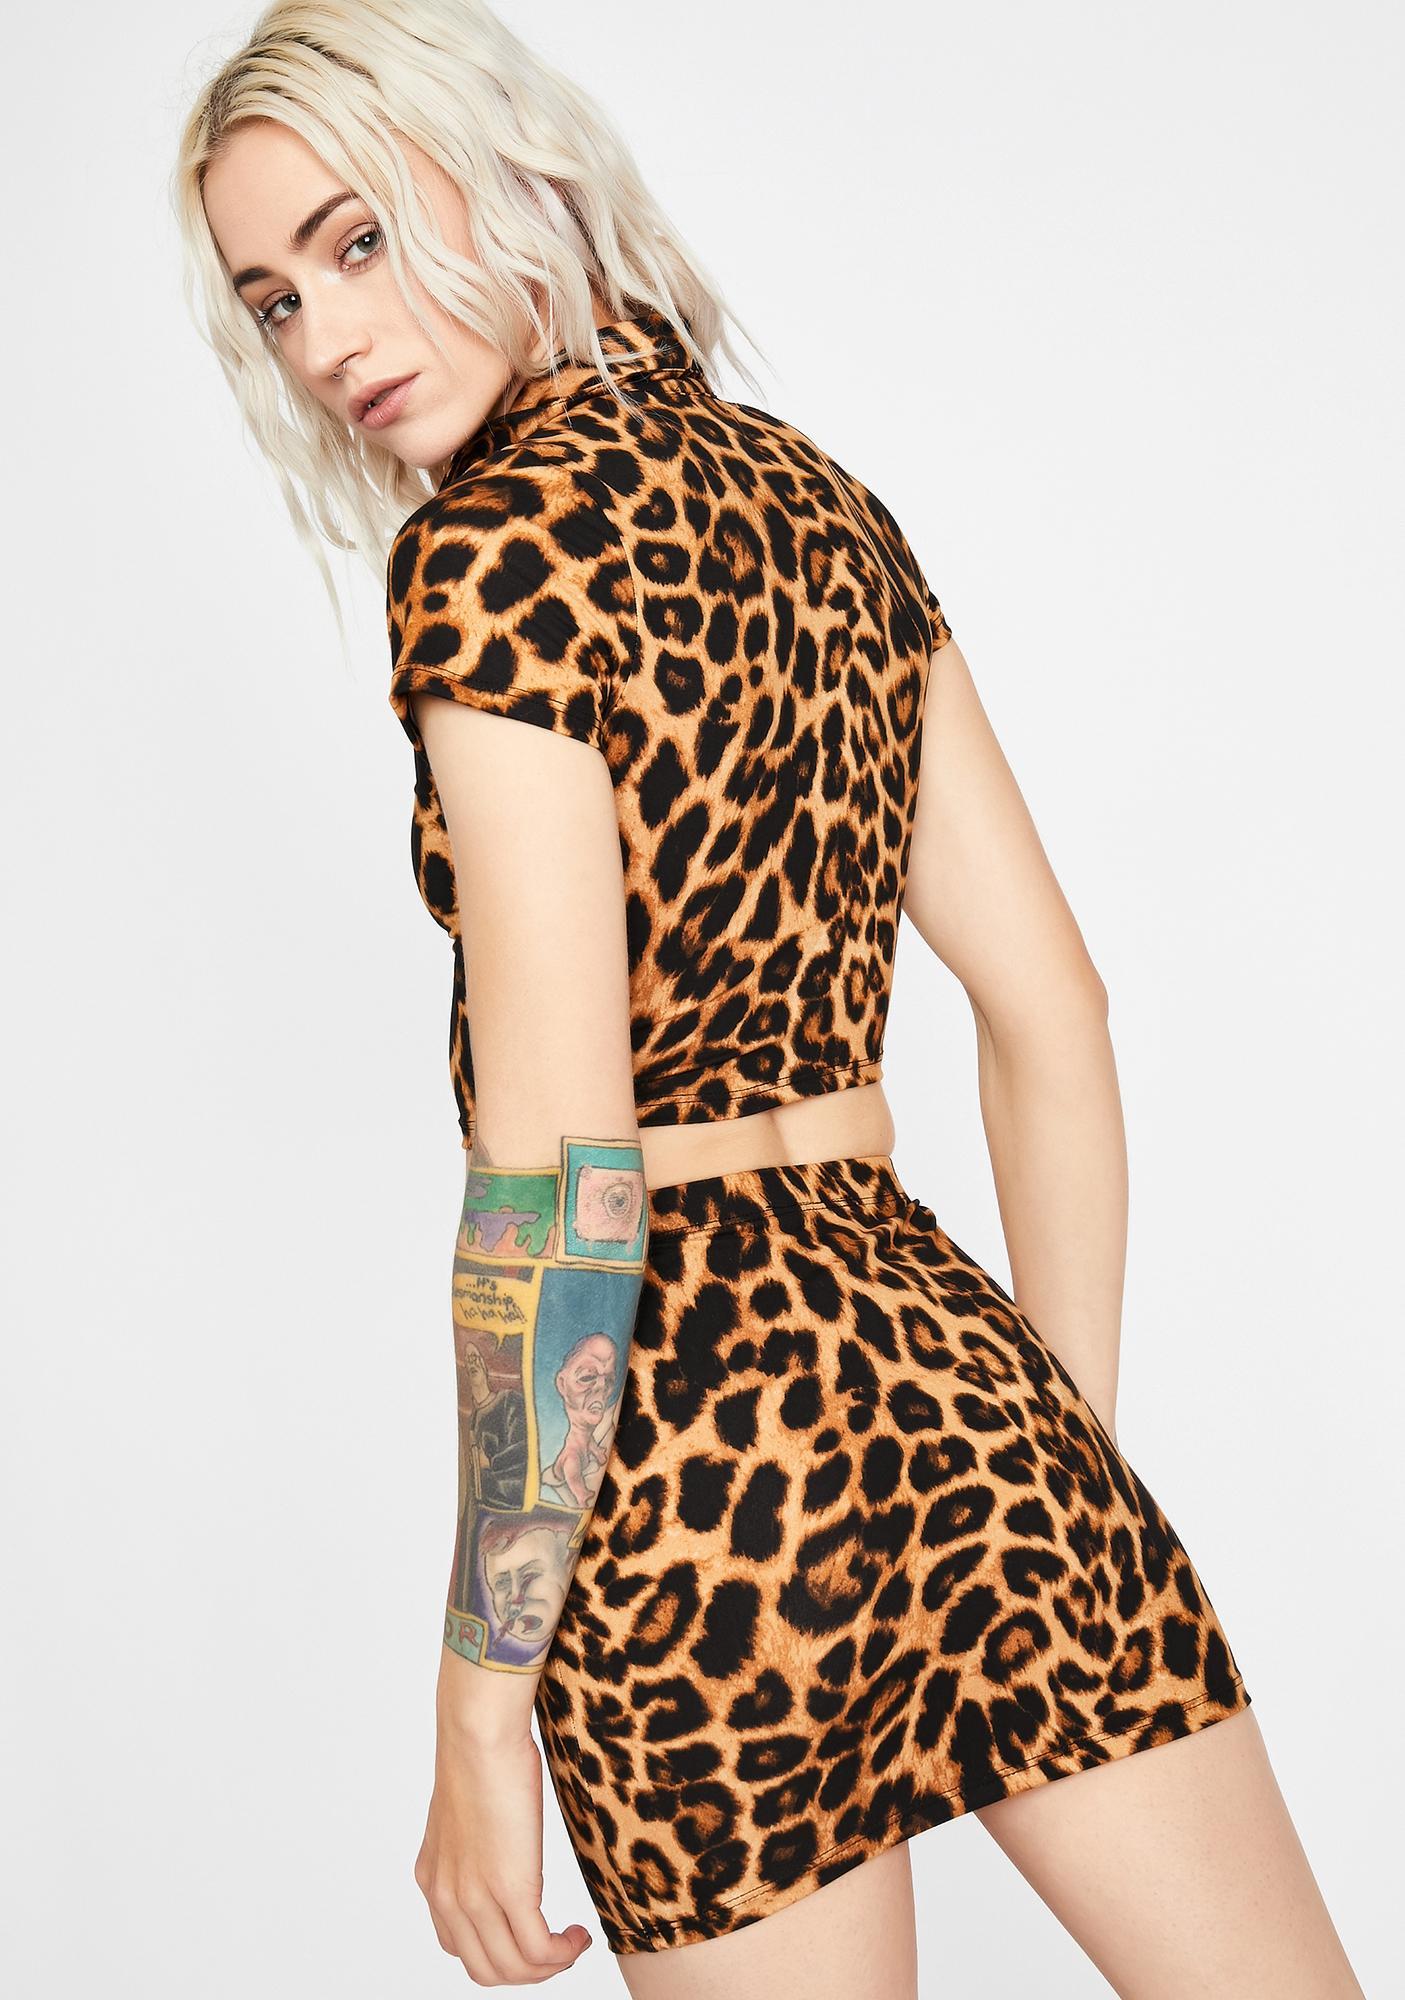 Bloodline Banger Skirt Set